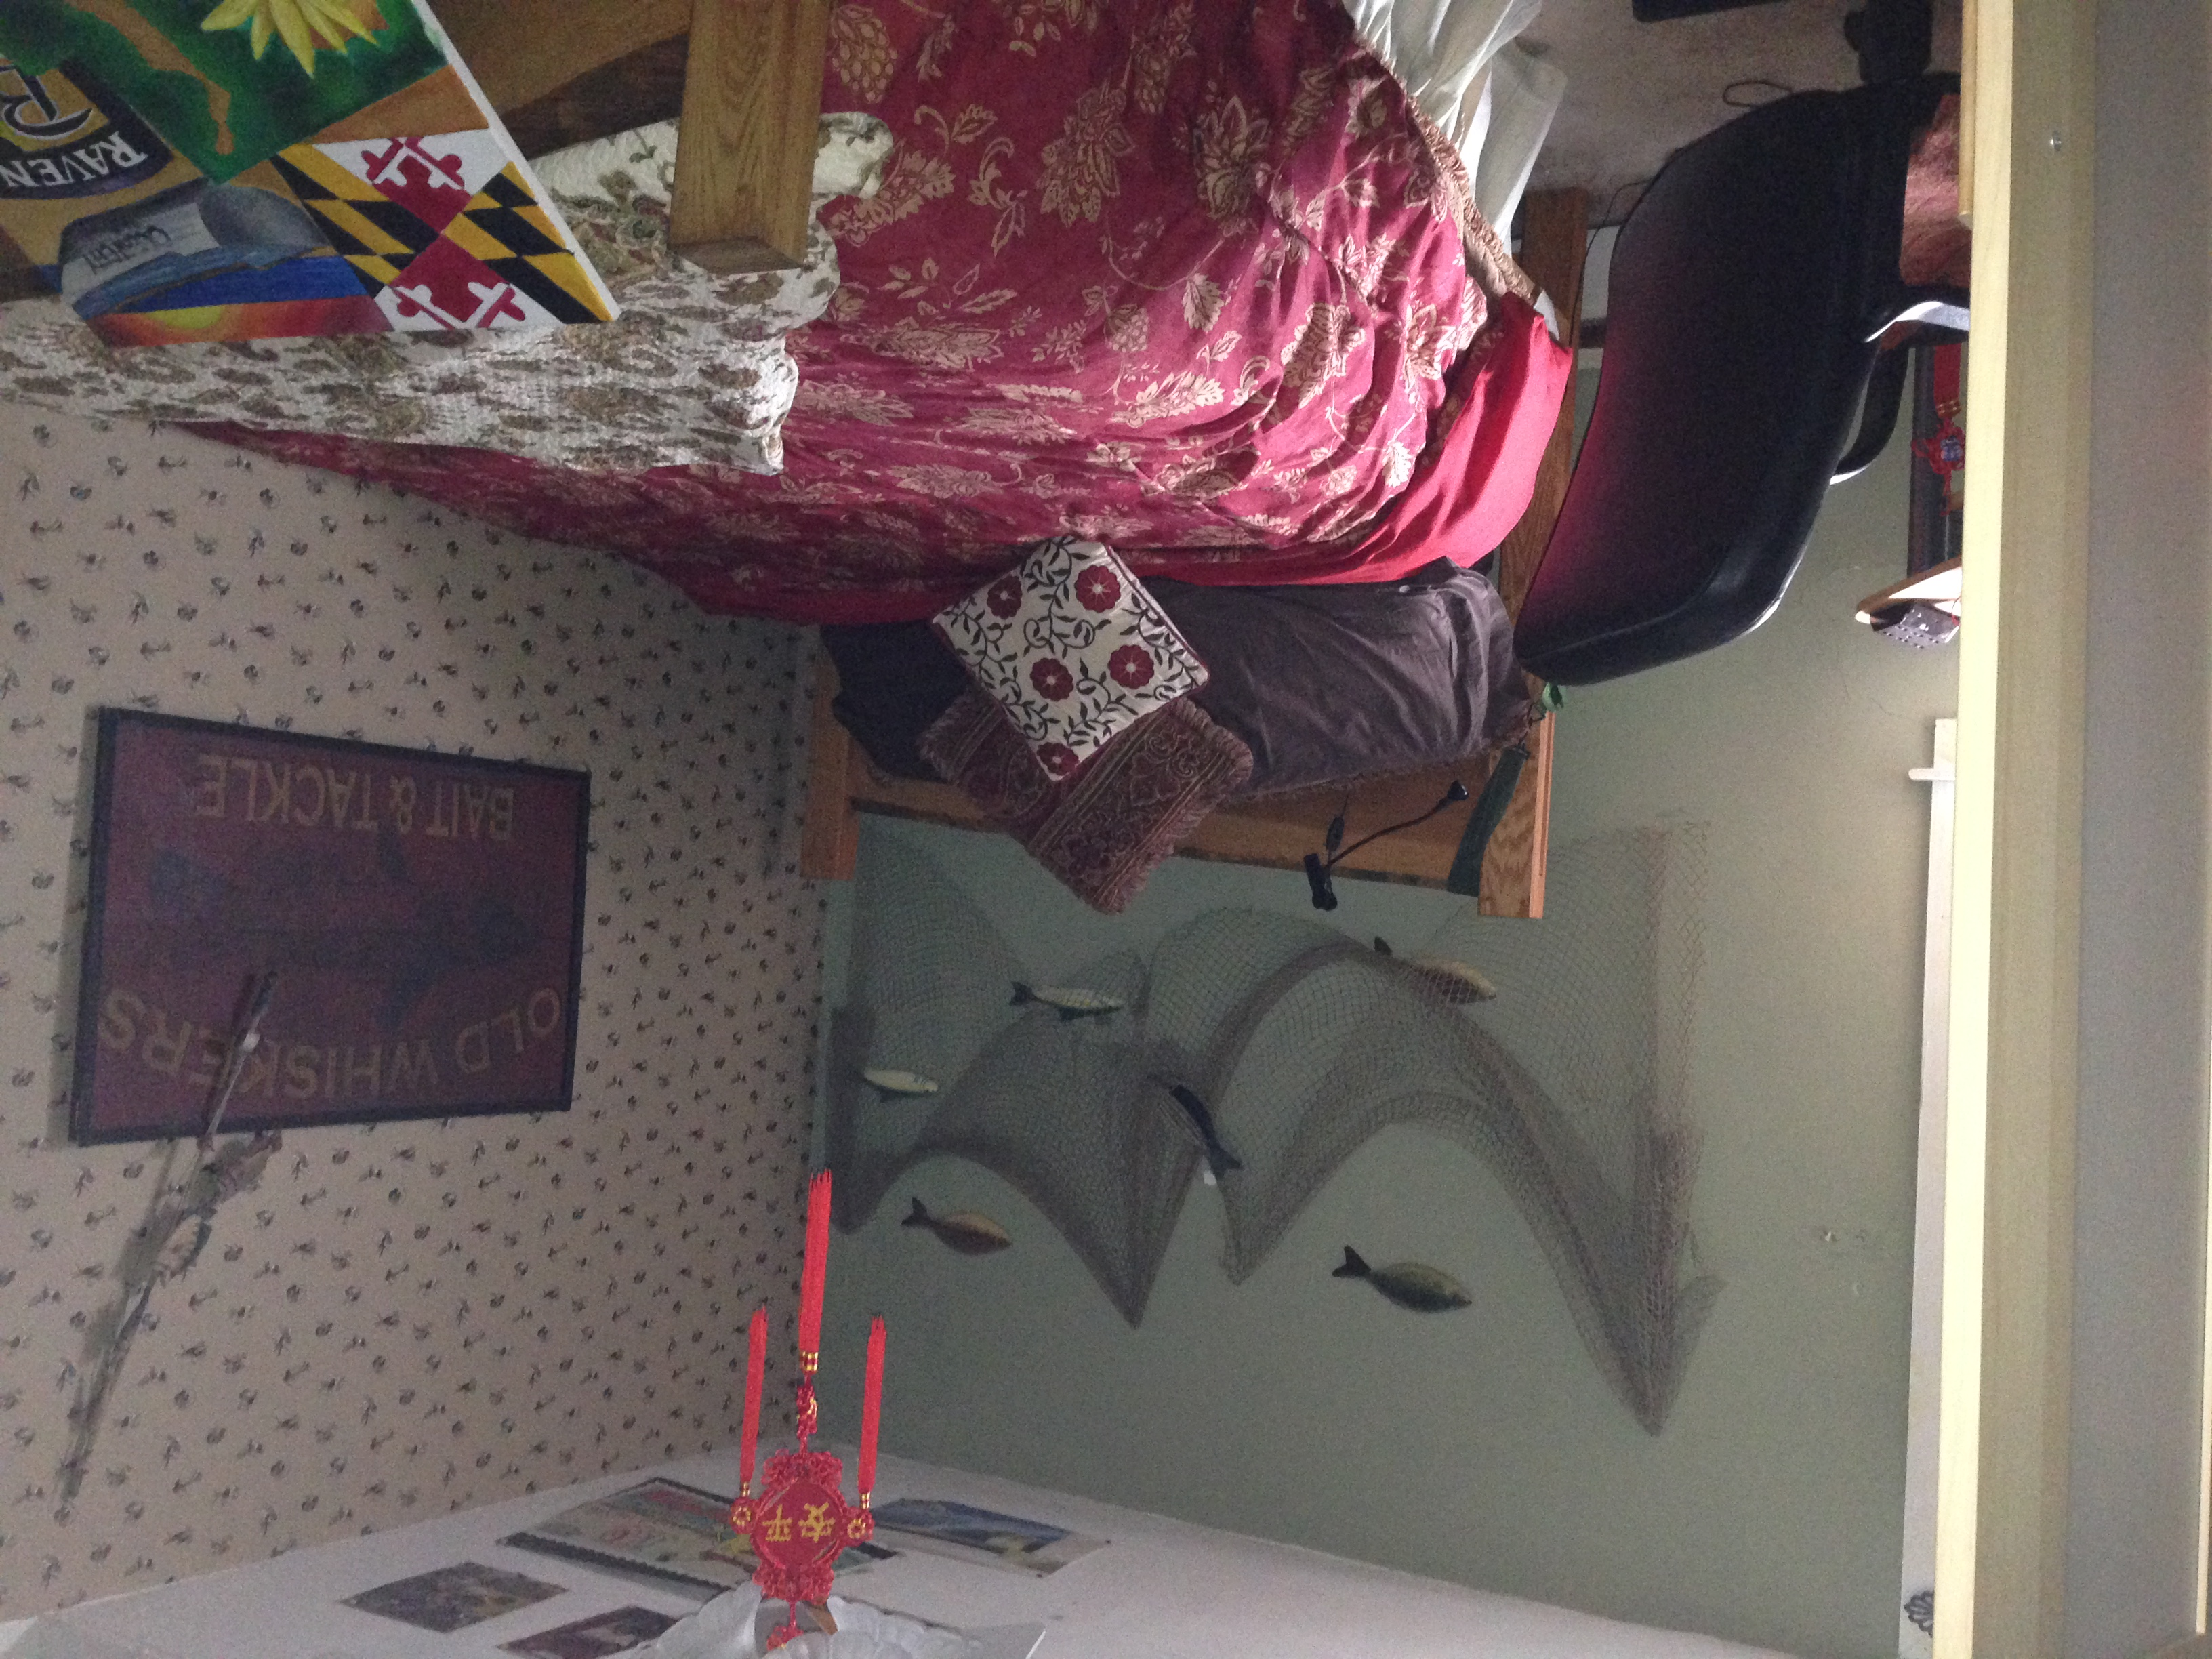 saint inigoes buddhist singles Saint inigoes boat ramp along smith creek offers single launching lane, courtesy docks, picnic area, shoreline fishing & portable restrooms saint marys city park hand launch 47498 trinity church road st mary's city, md 20686.